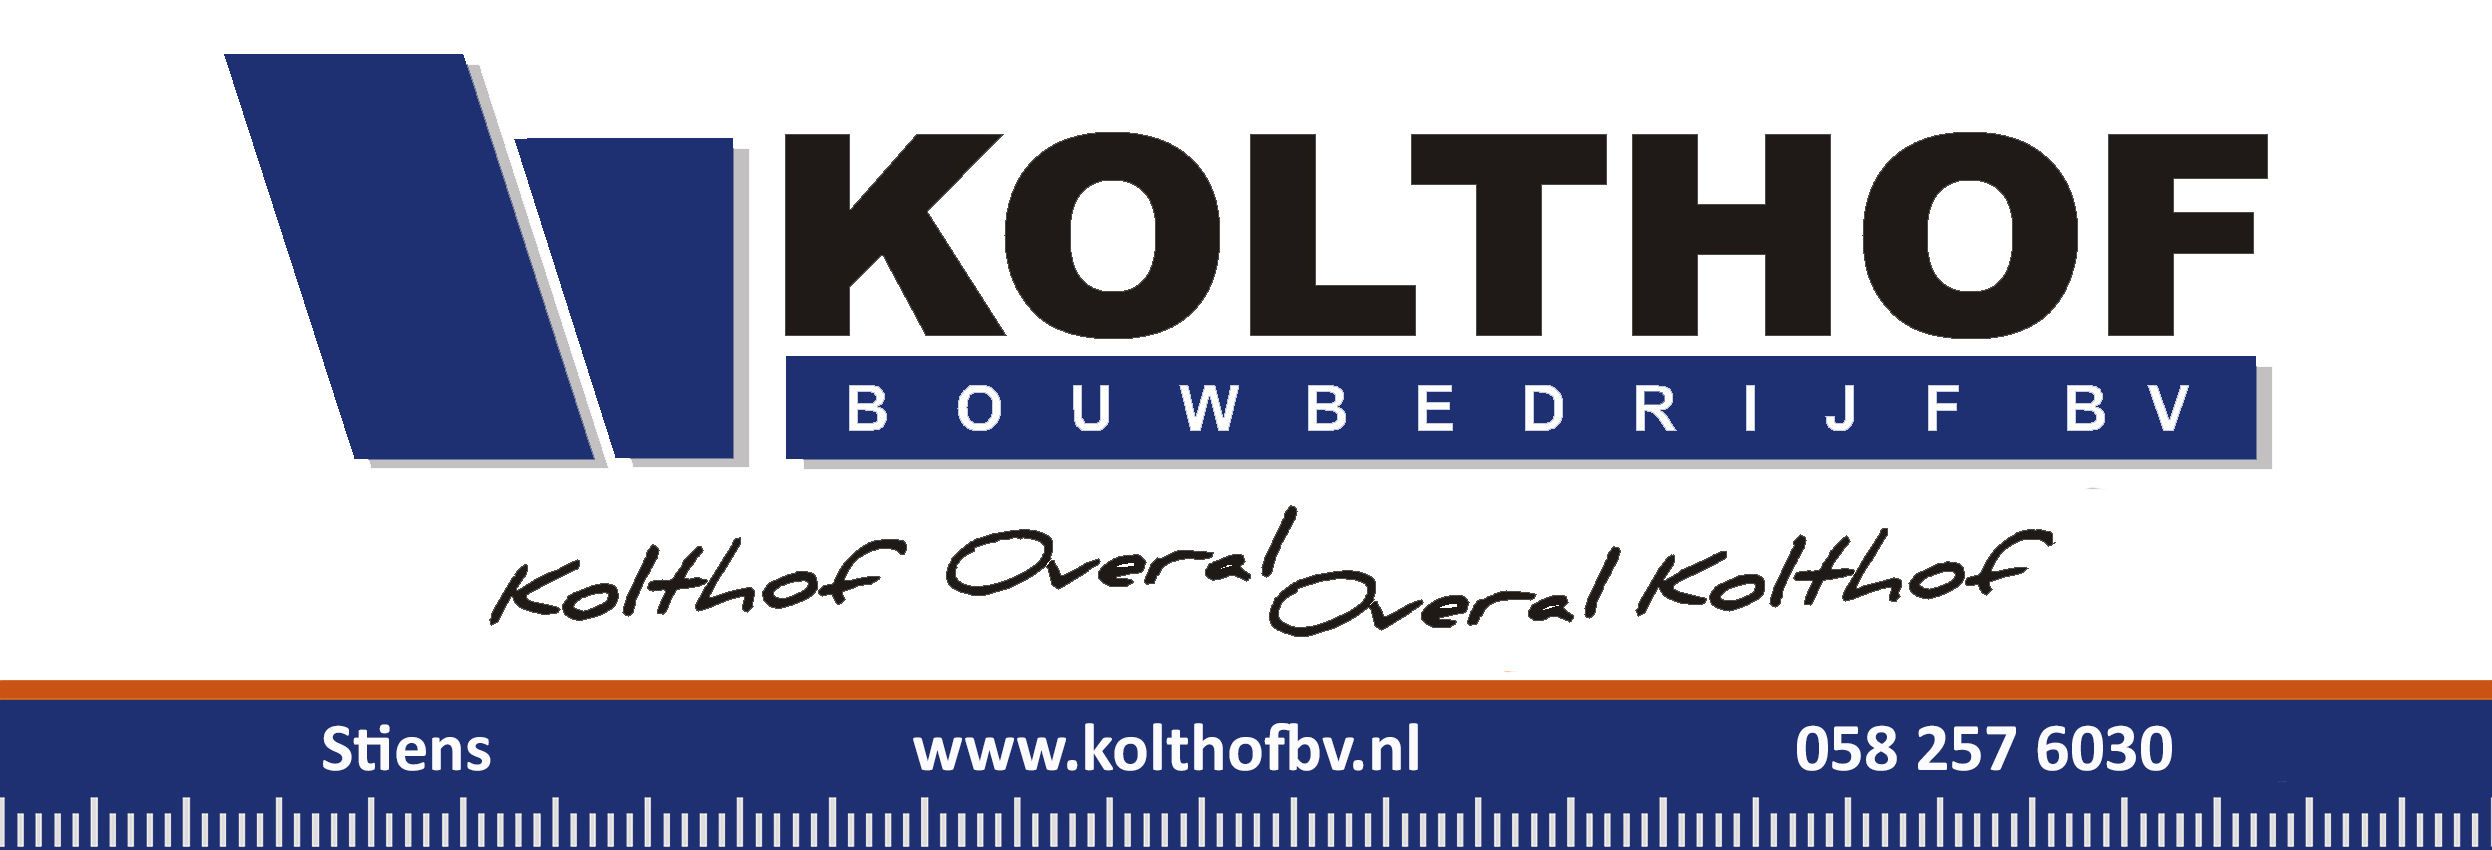 Kolthof